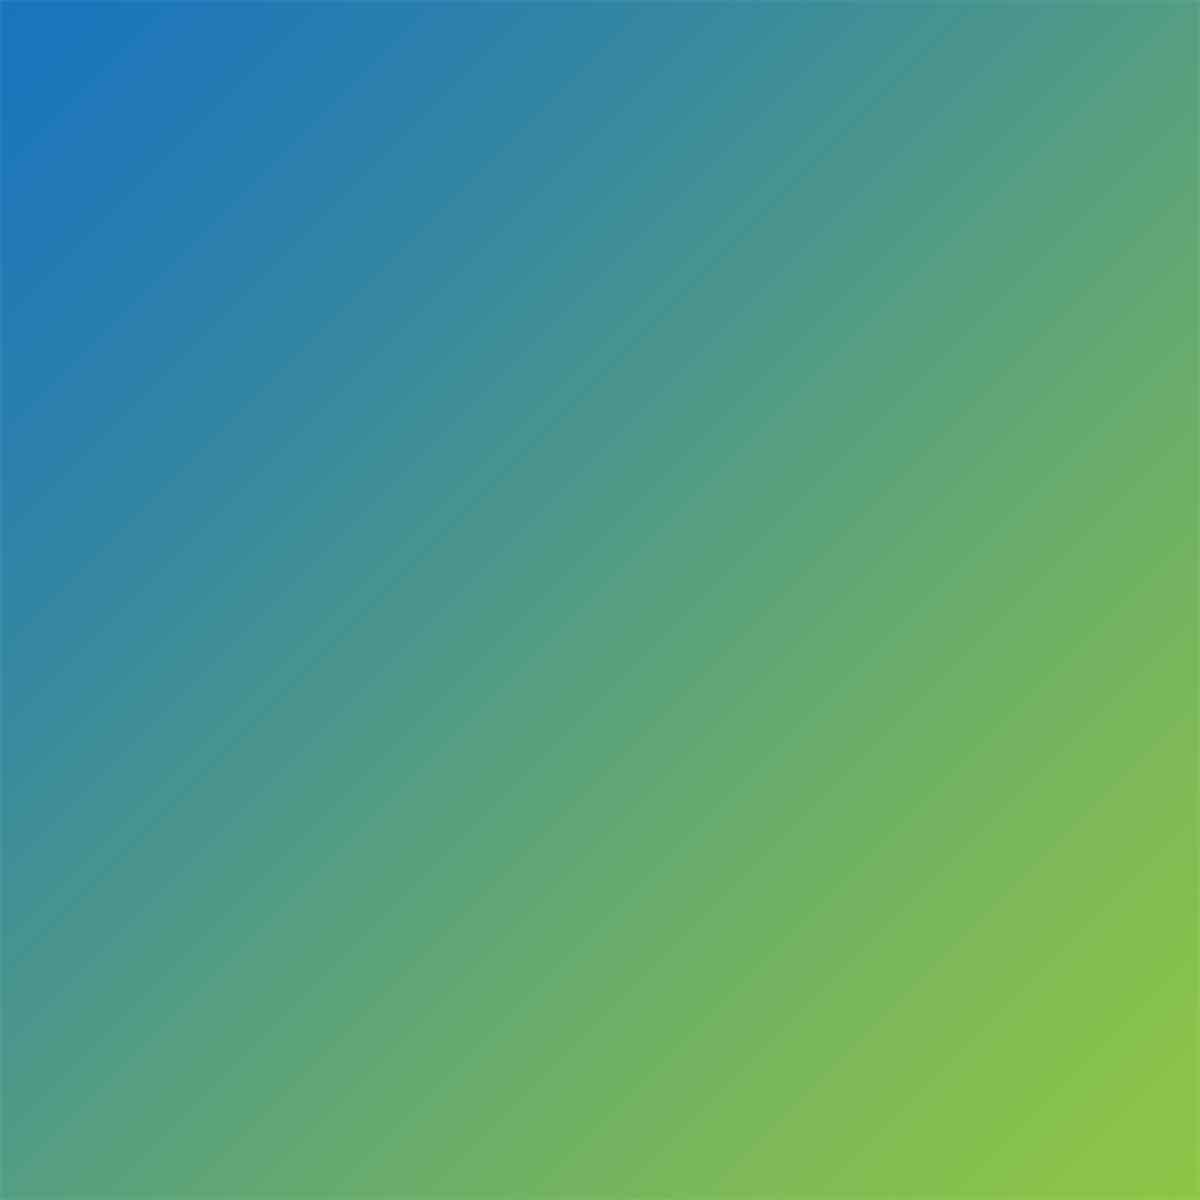 https://www.tembeta.cl/wp-content/uploads/2018/09/bgn-image-box-gradient.jpg